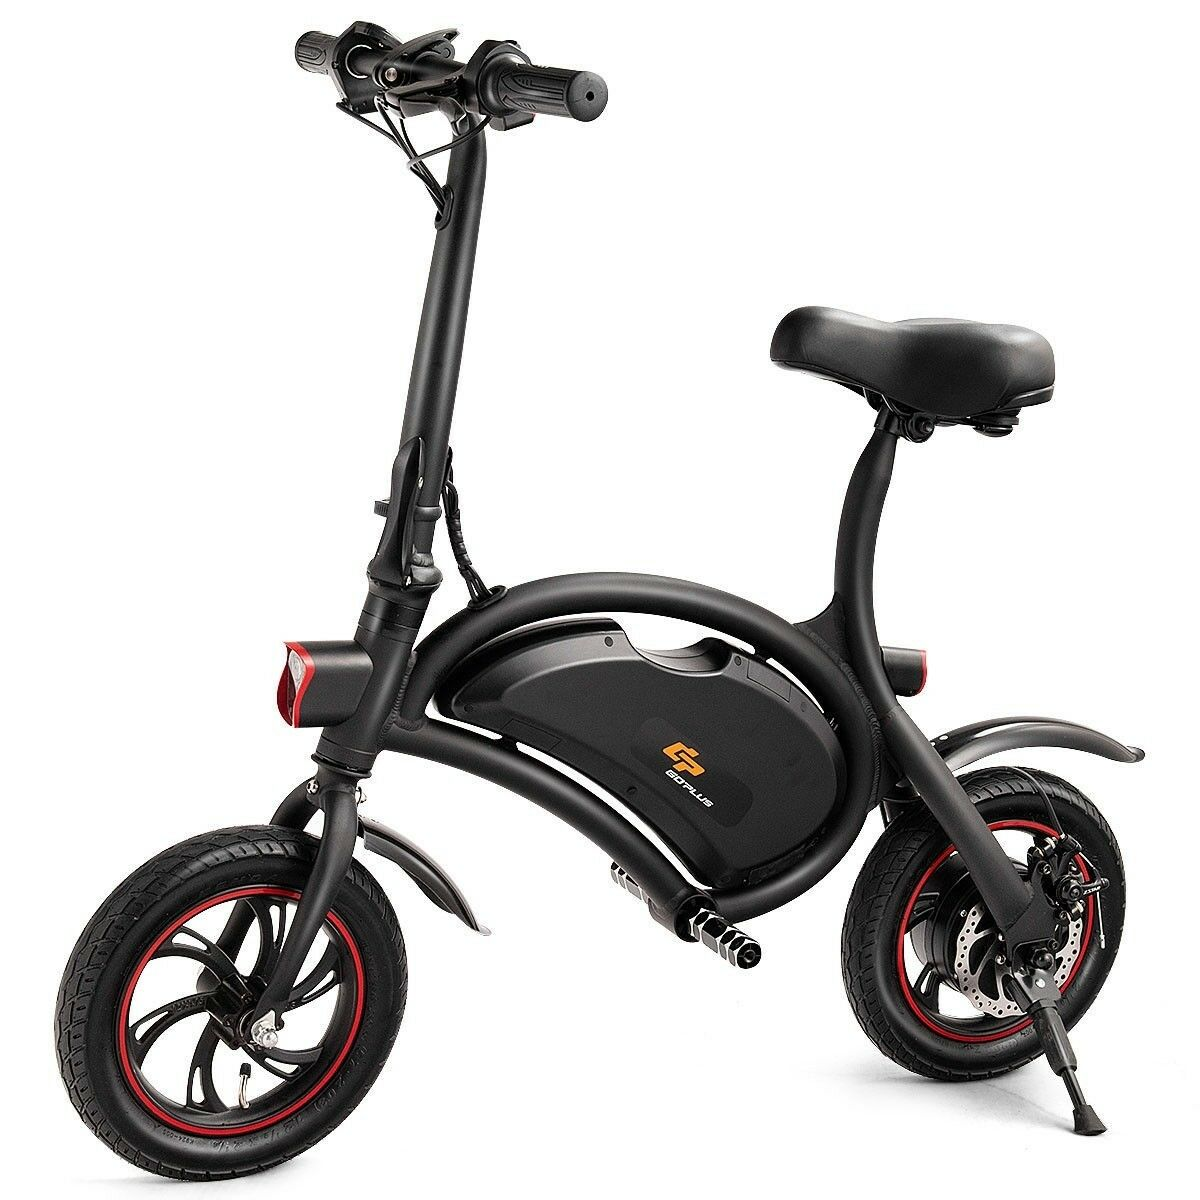 36  x 39  x 19  Folding Electric Bike Bicycle EBike Cruise Control Headlight APP